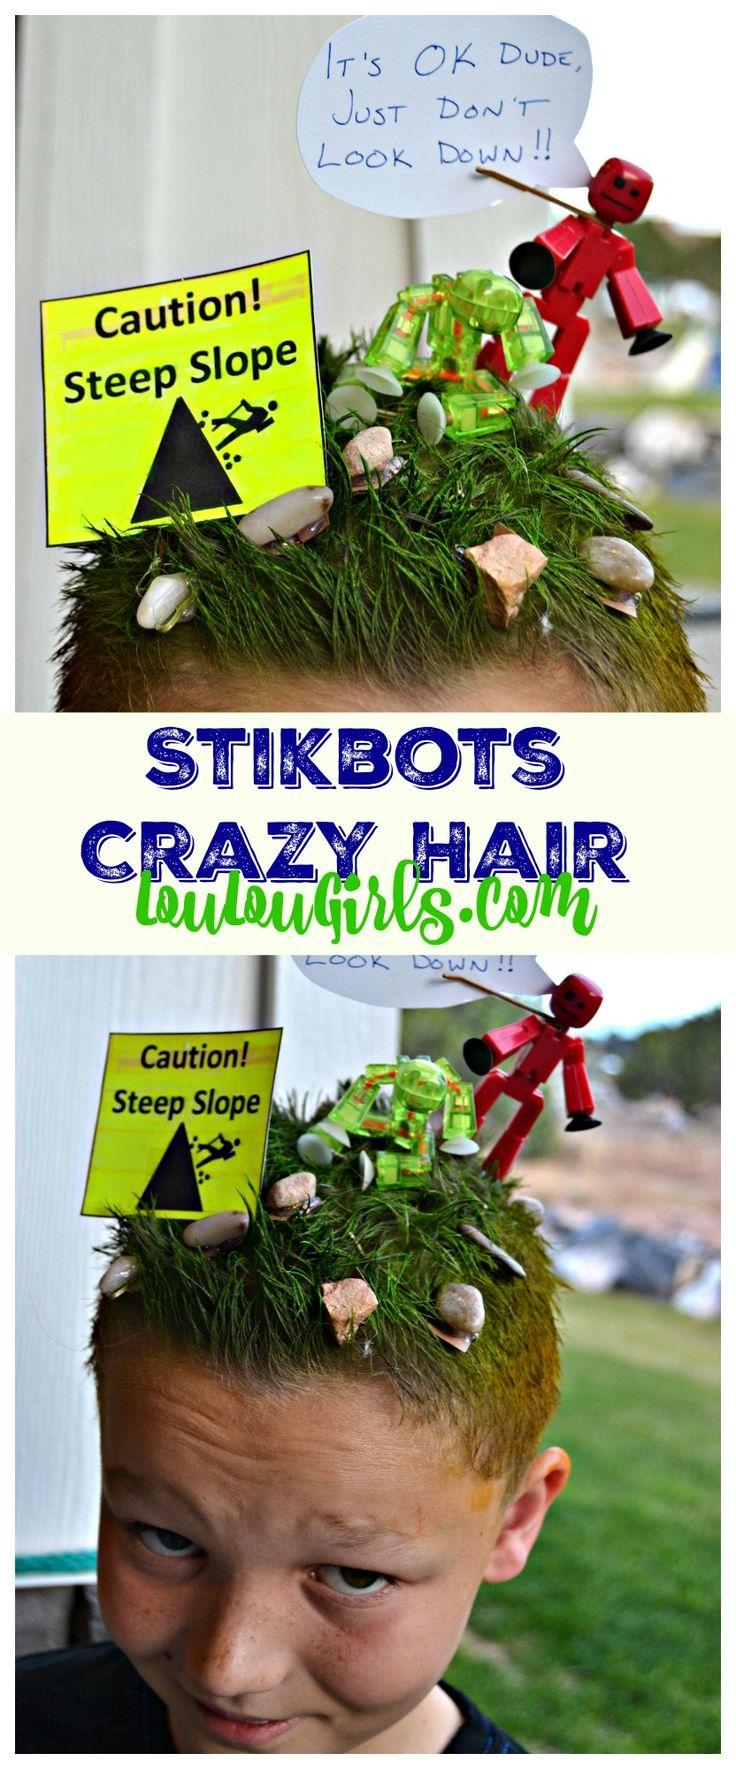 stikbots-crazy-hair-day-idea-boy! #stikbots #crazy #hair #day #tips #ideas #inspiration